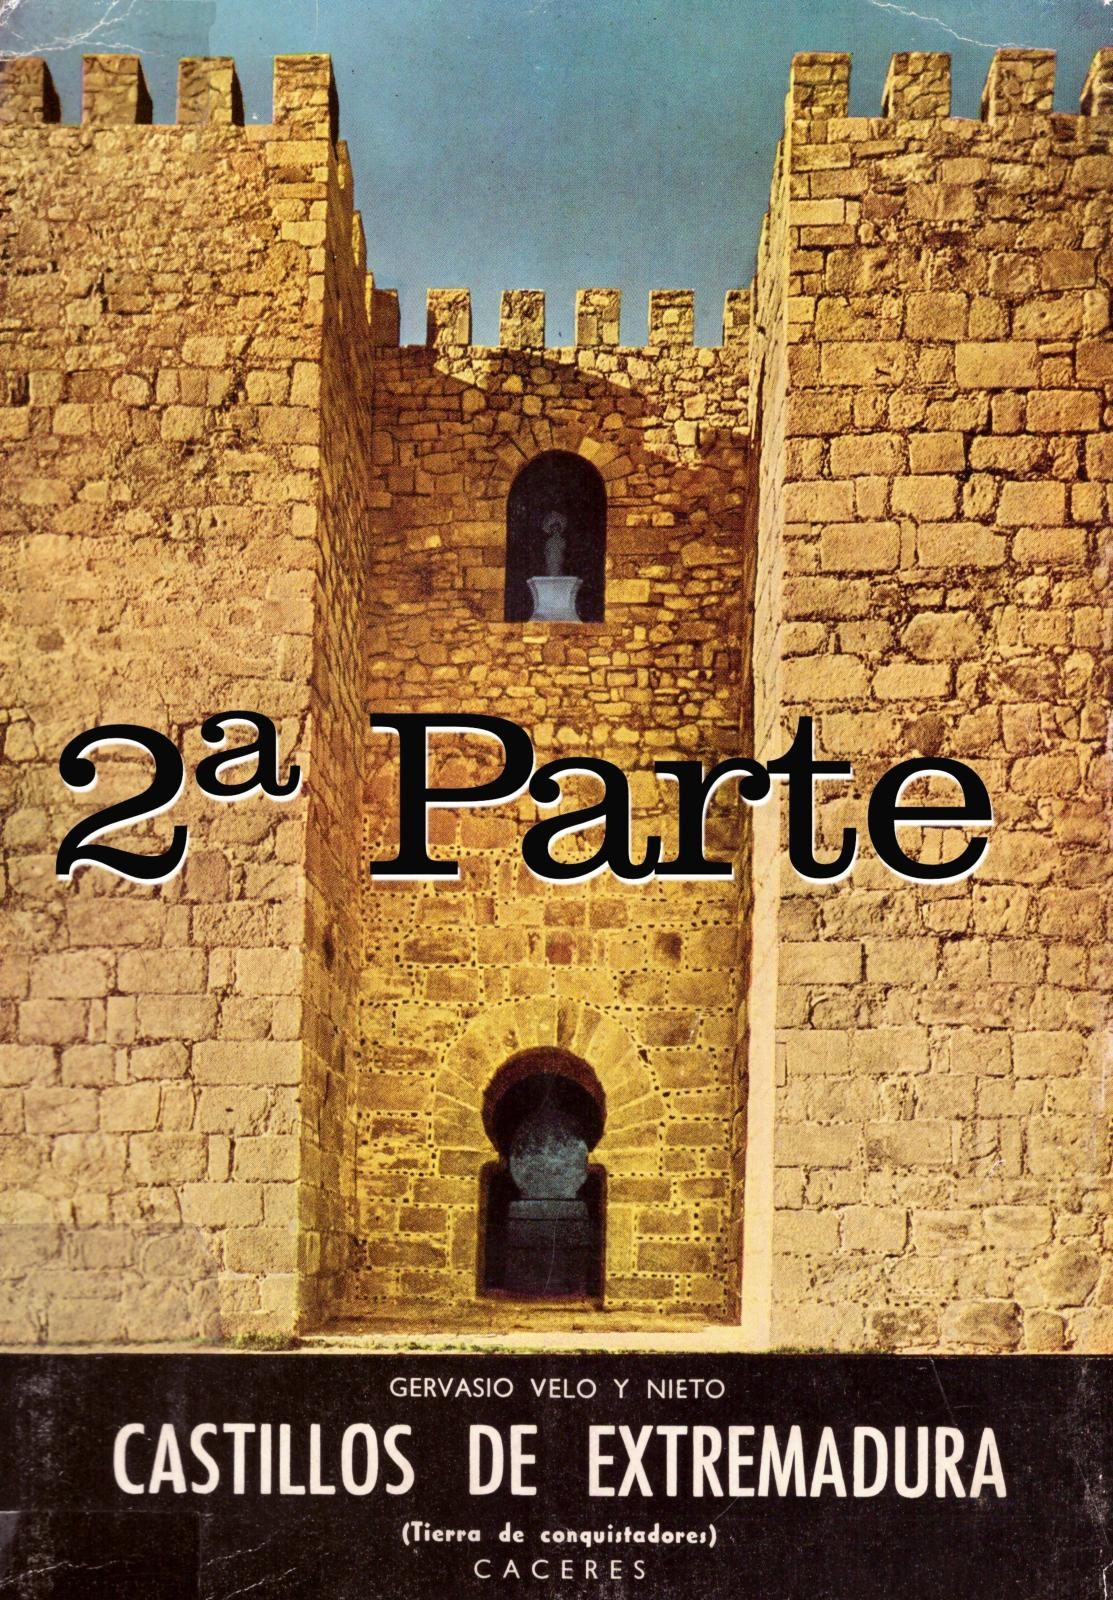 Calaméo - Castillos de Extremadura. Cáceres (2ª Parte) por Gervasio ...